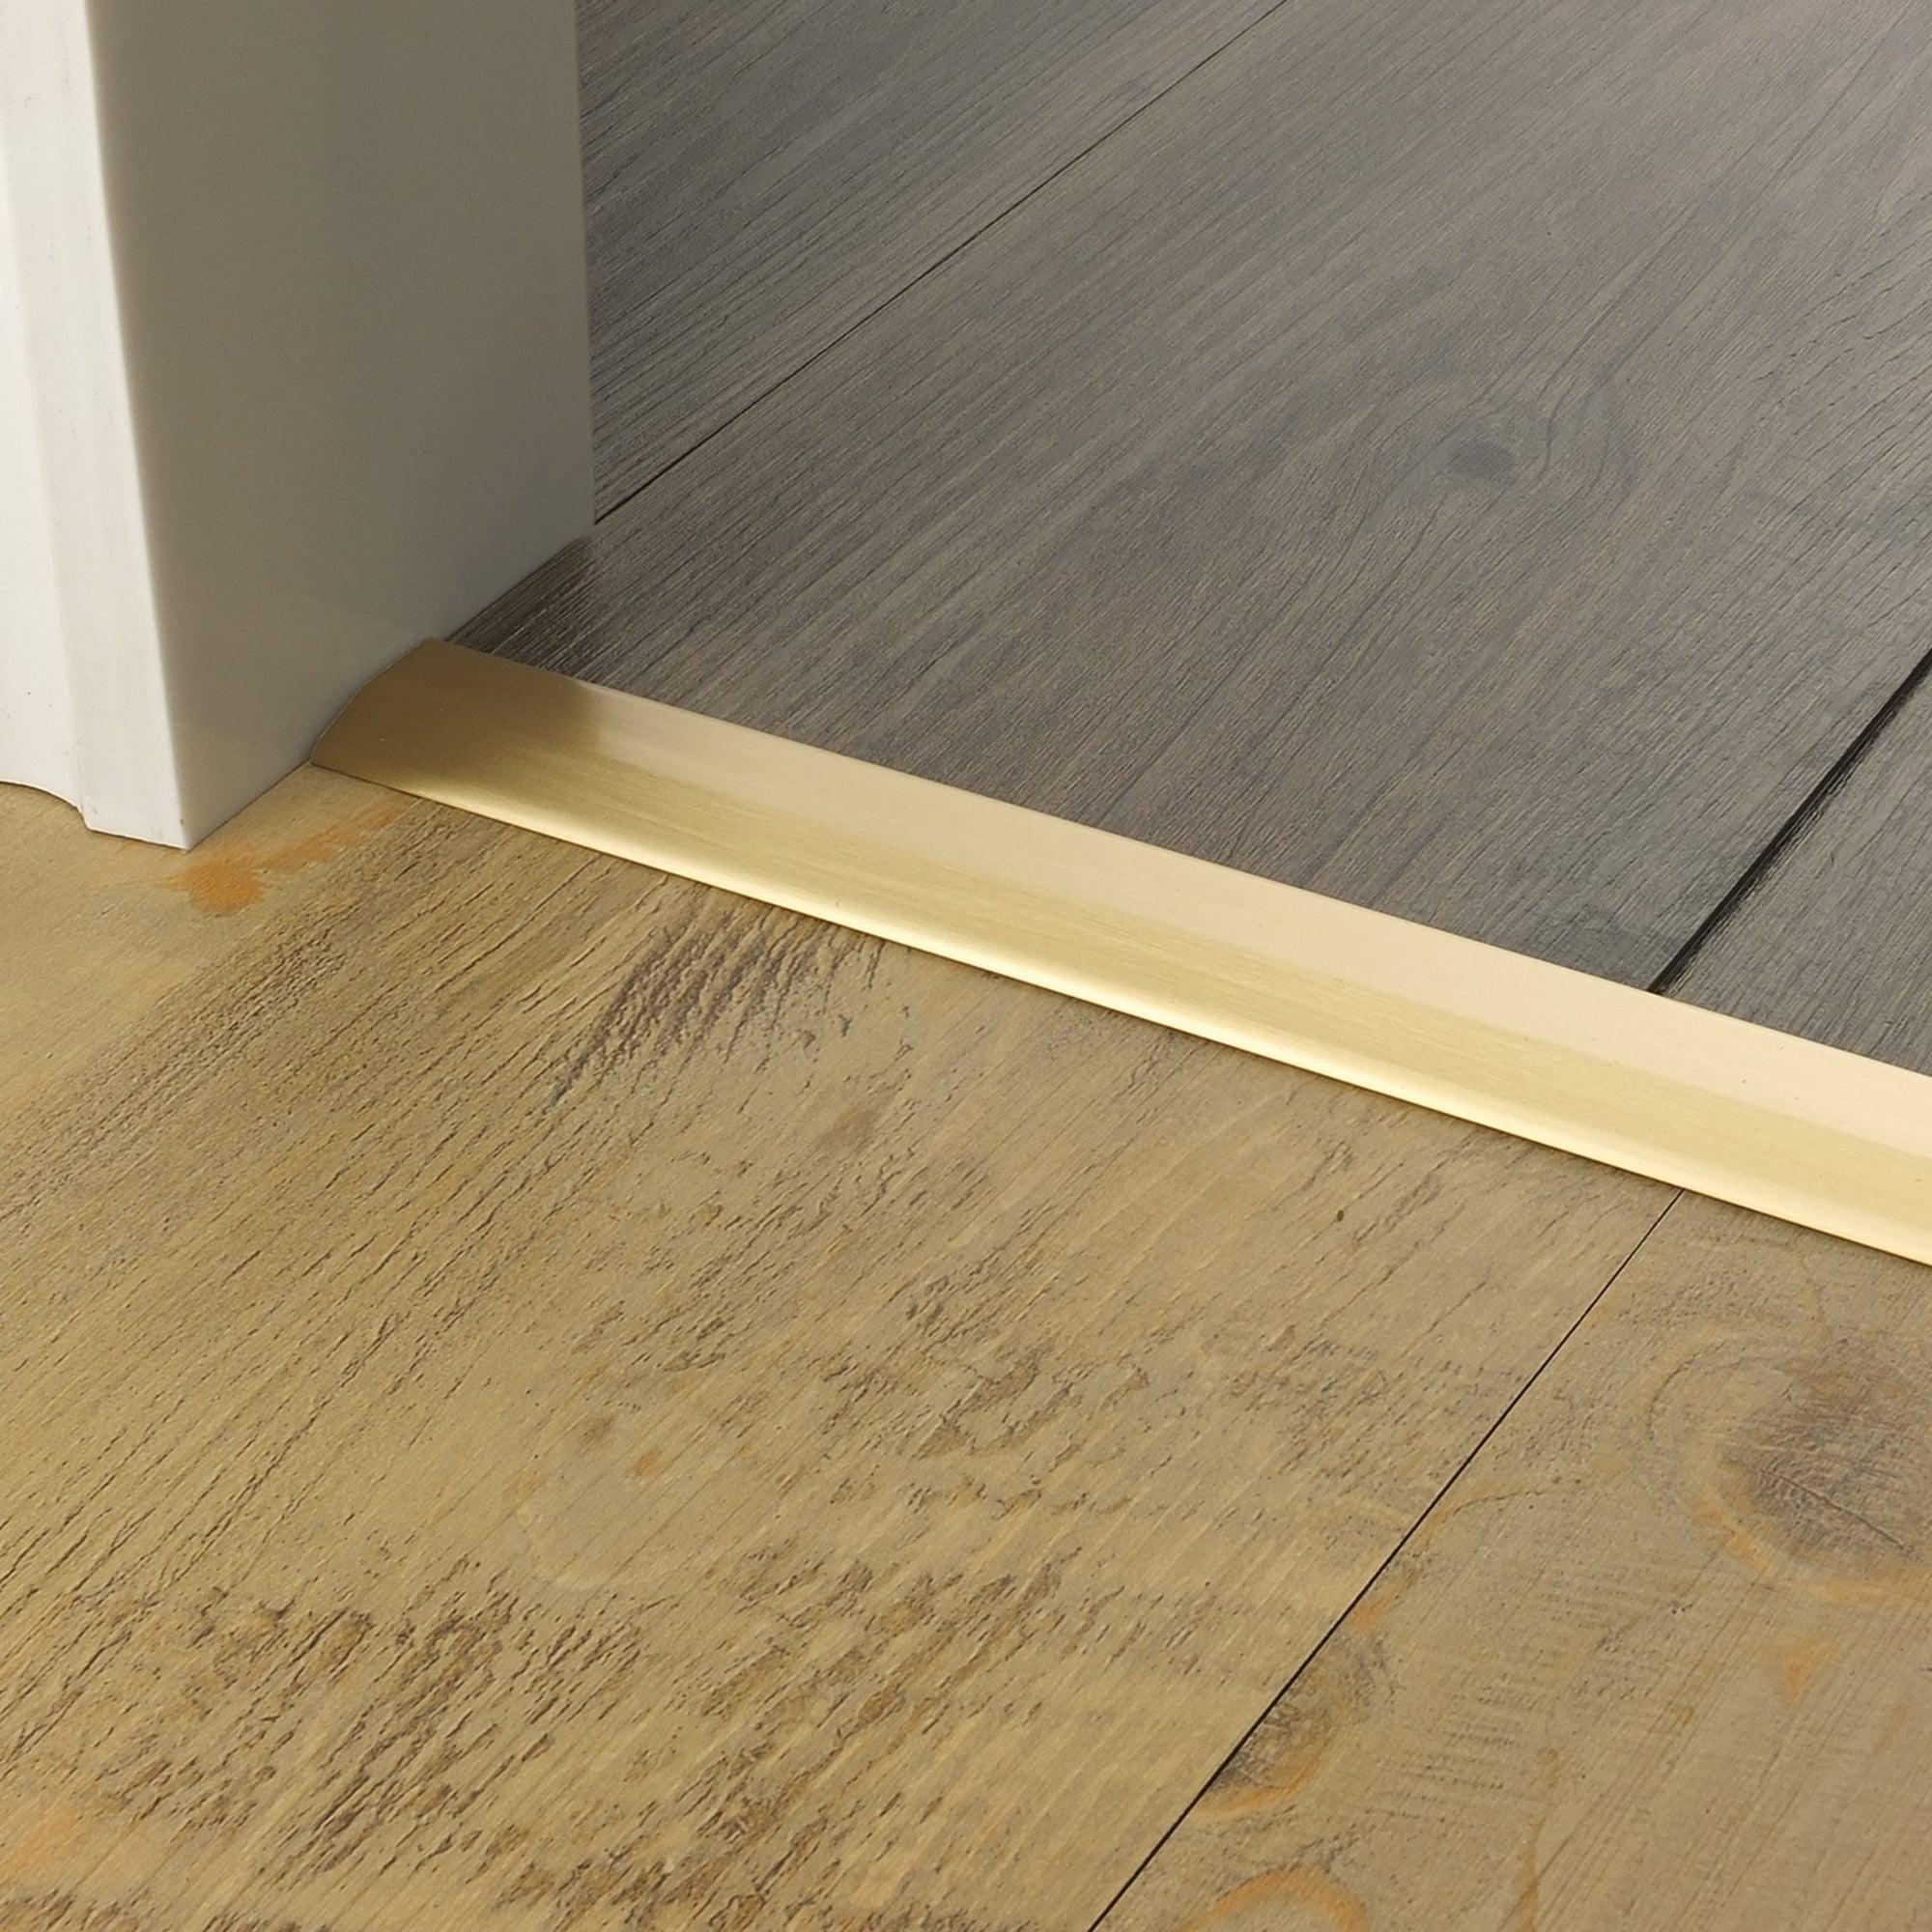 of flooring and design gallery trim yohaku glue tile me for floor wood